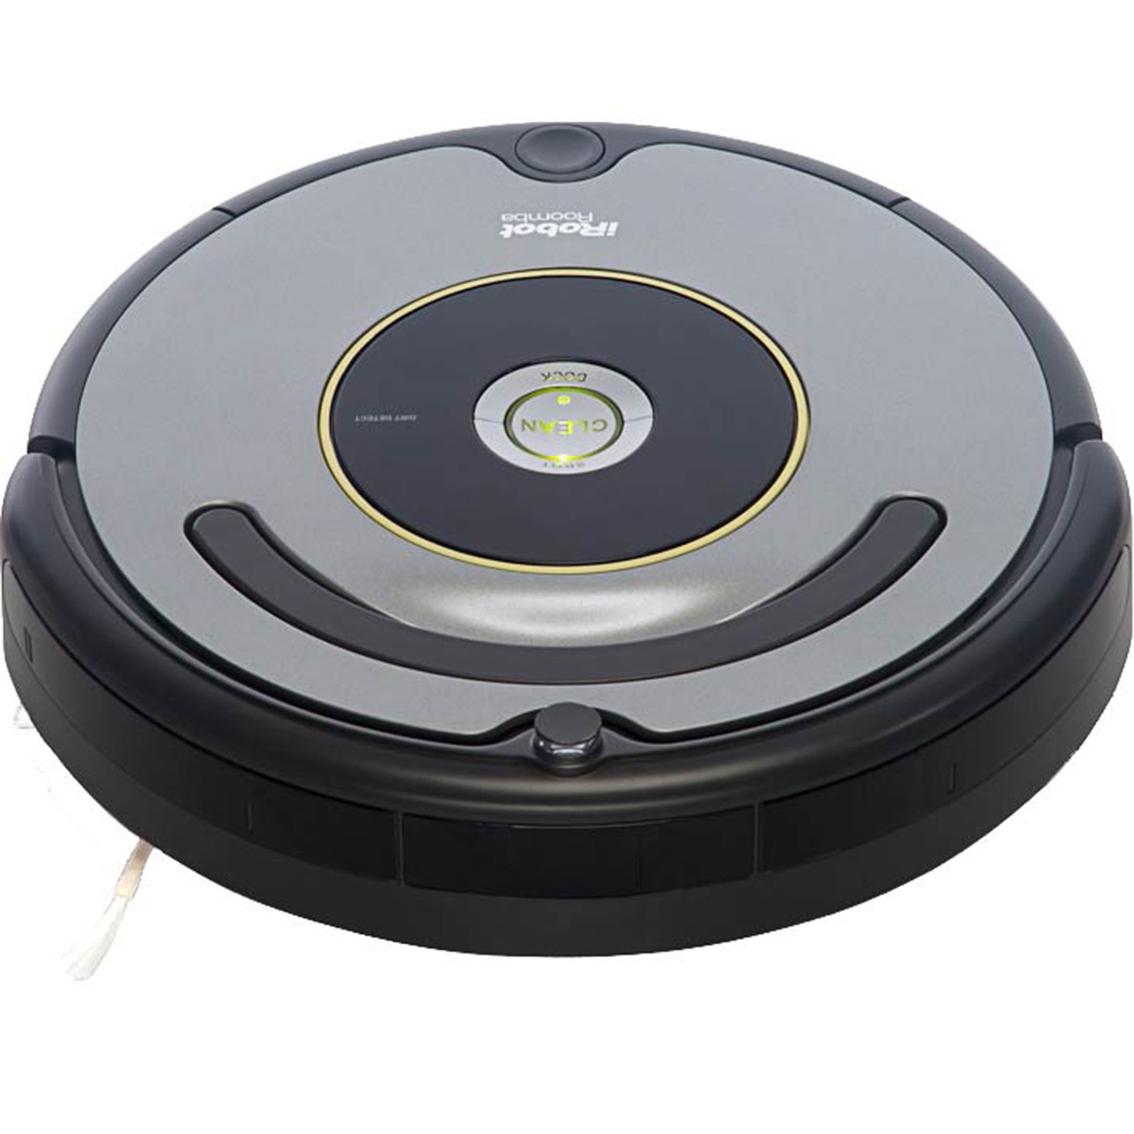 irobot roomba 630 vacuum cleaning robot robotics handheld vacs home appliances shop. Black Bedroom Furniture Sets. Home Design Ideas